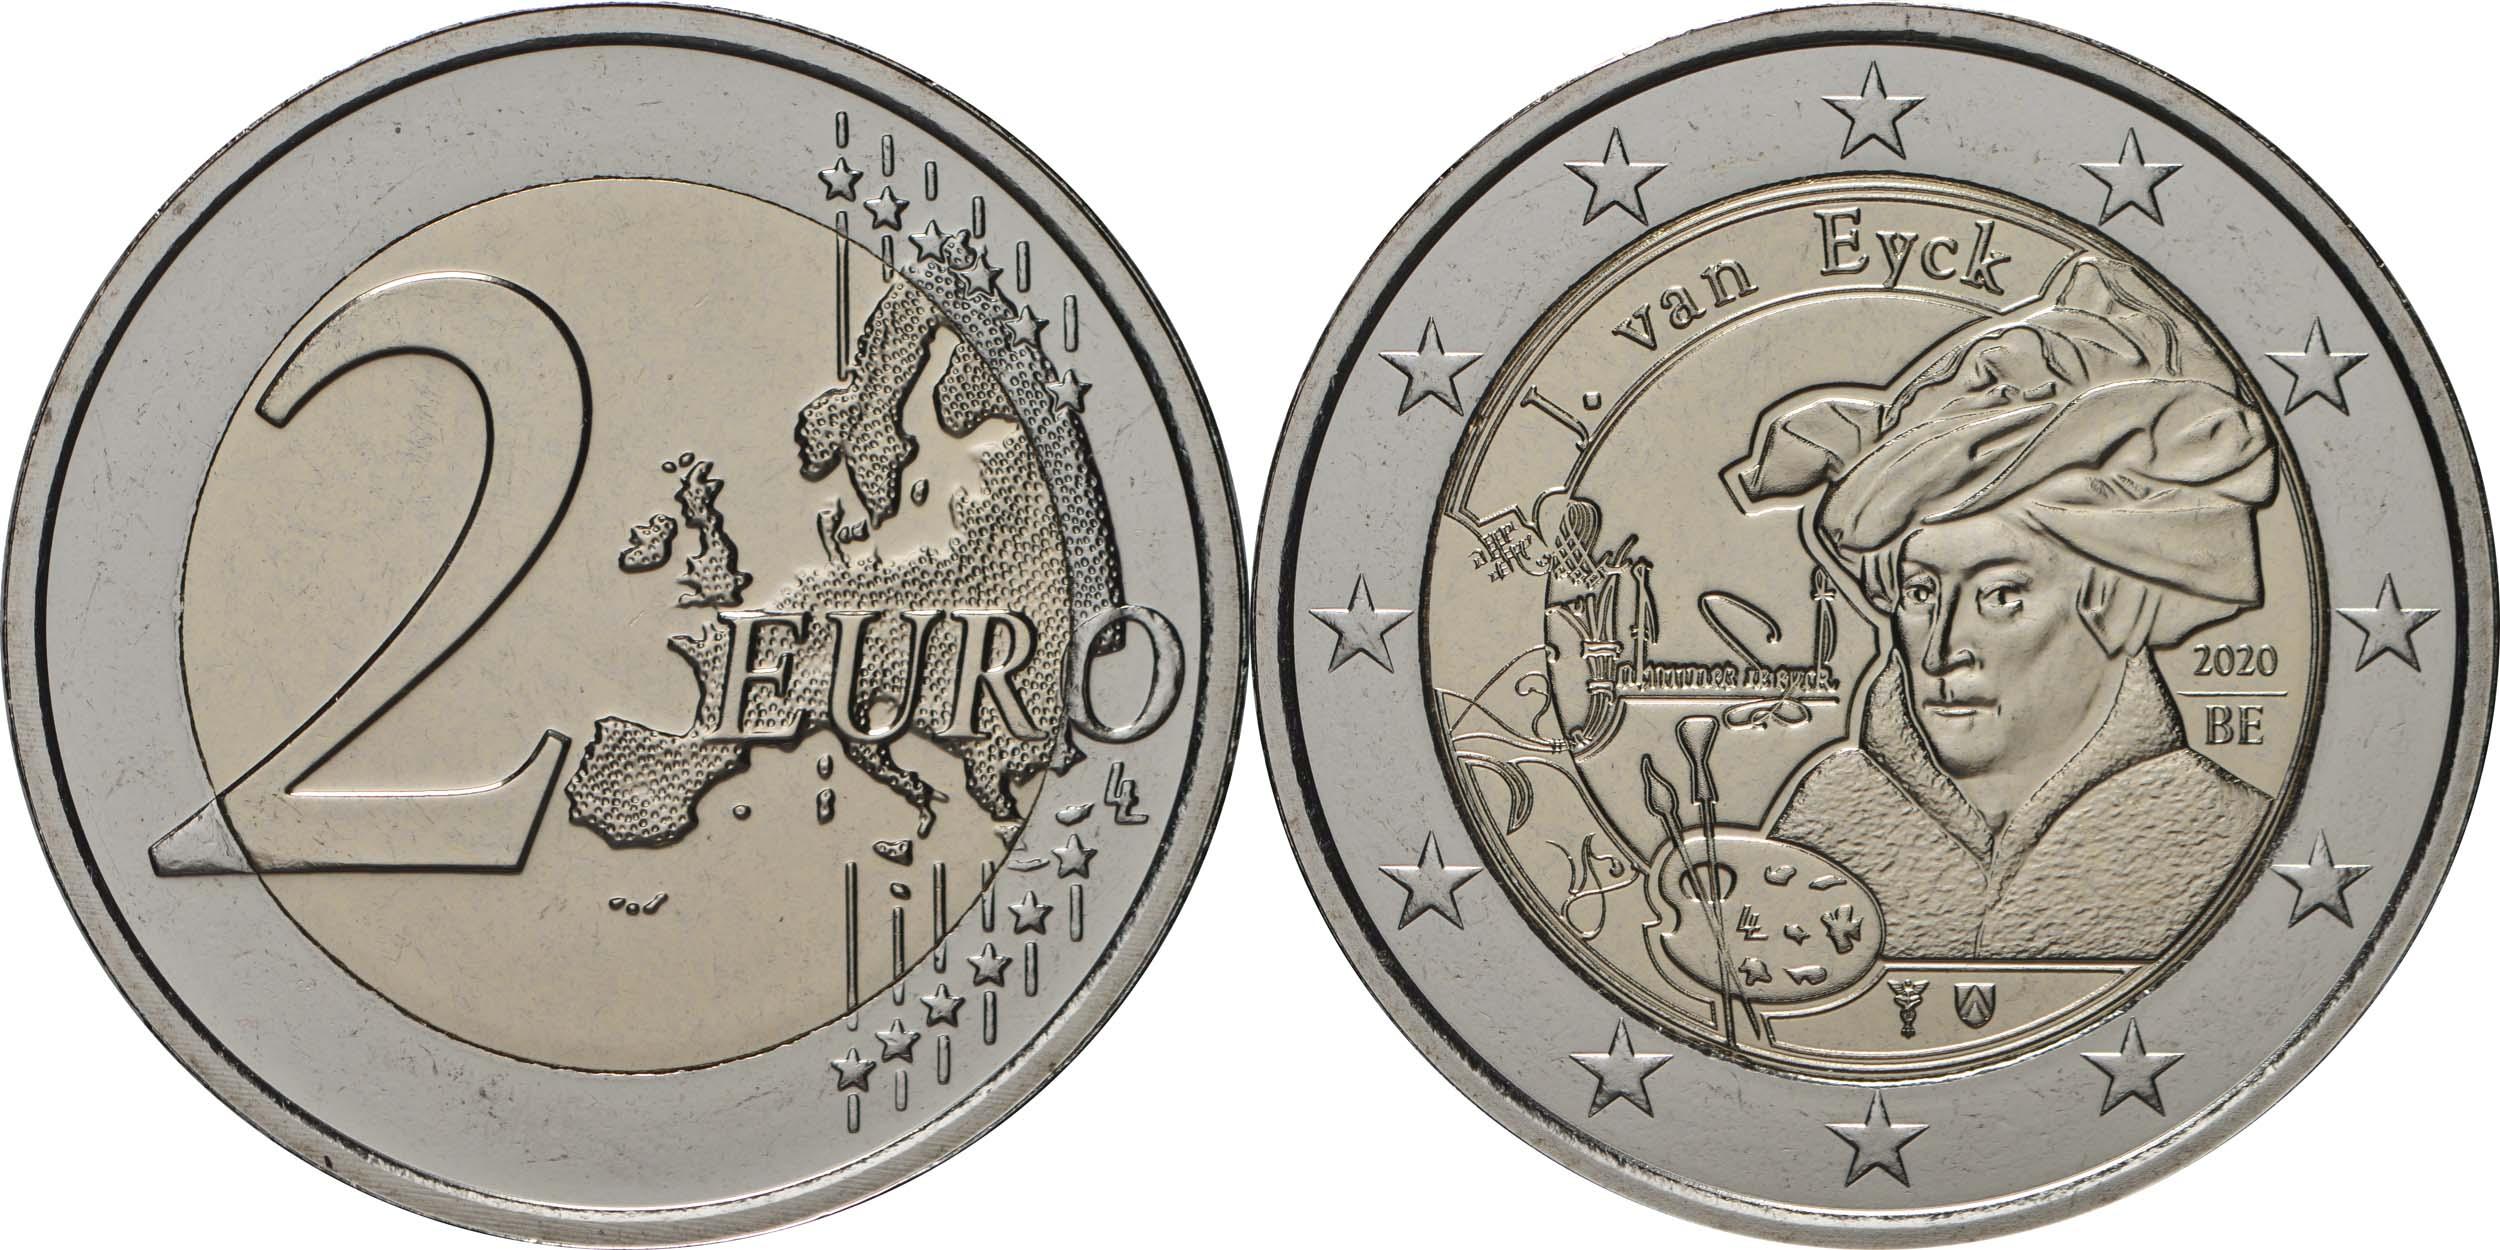 Lieferumfang:Belgien : 2 Euro Jan van Eyck  2020 bfr